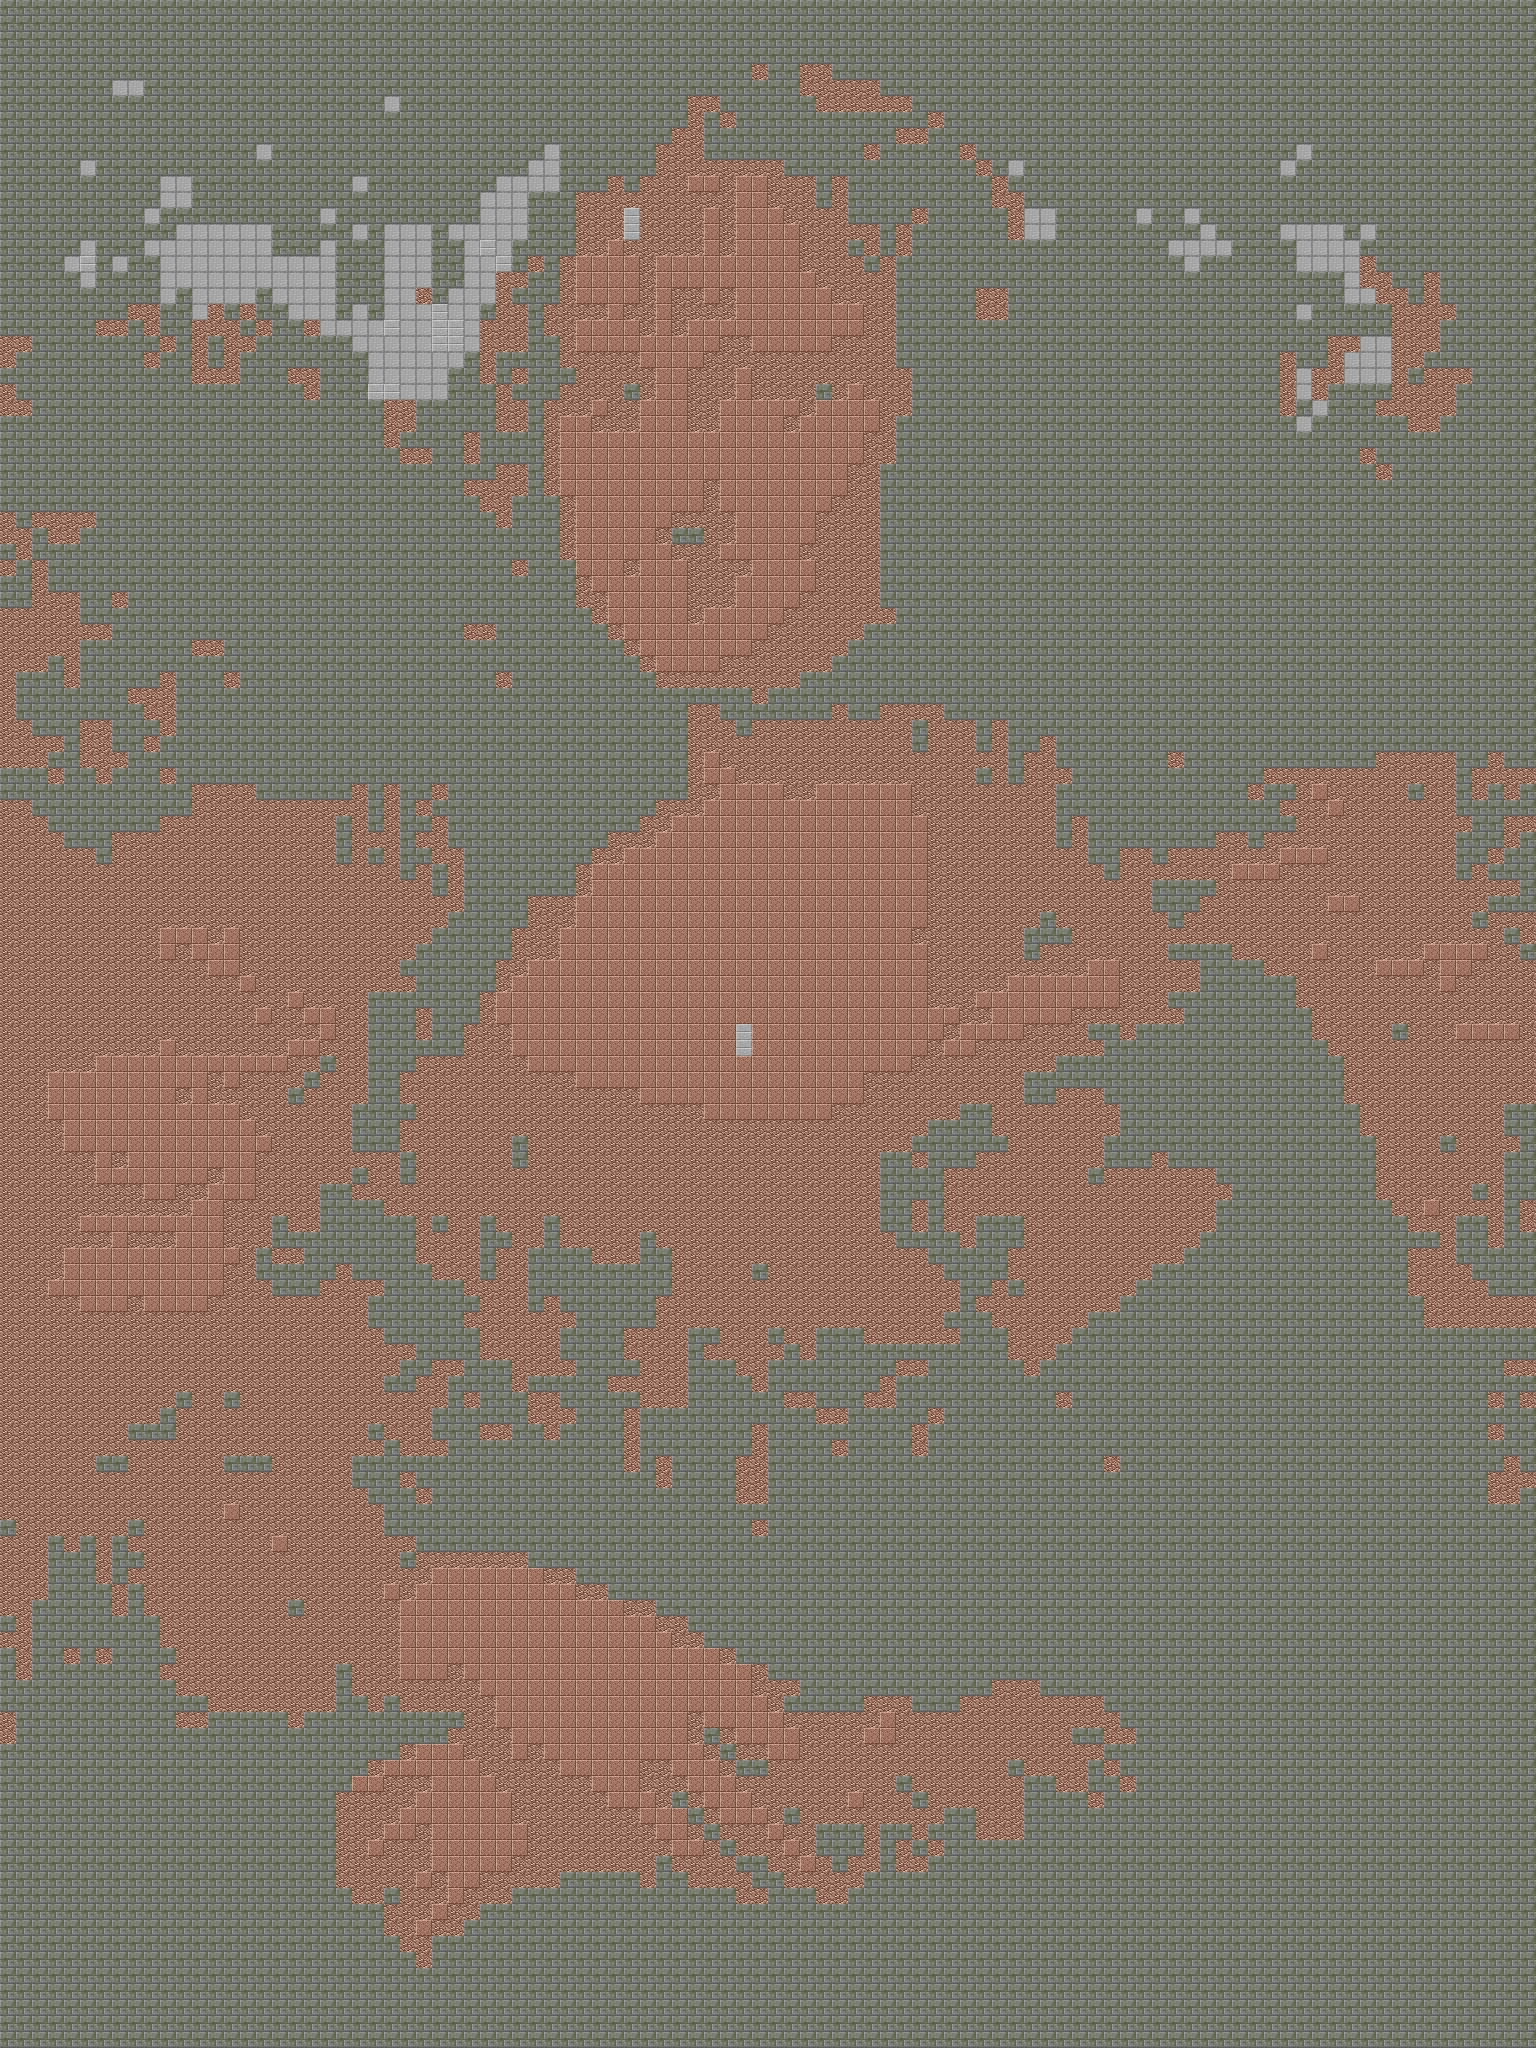 minecraft_dot (1).png